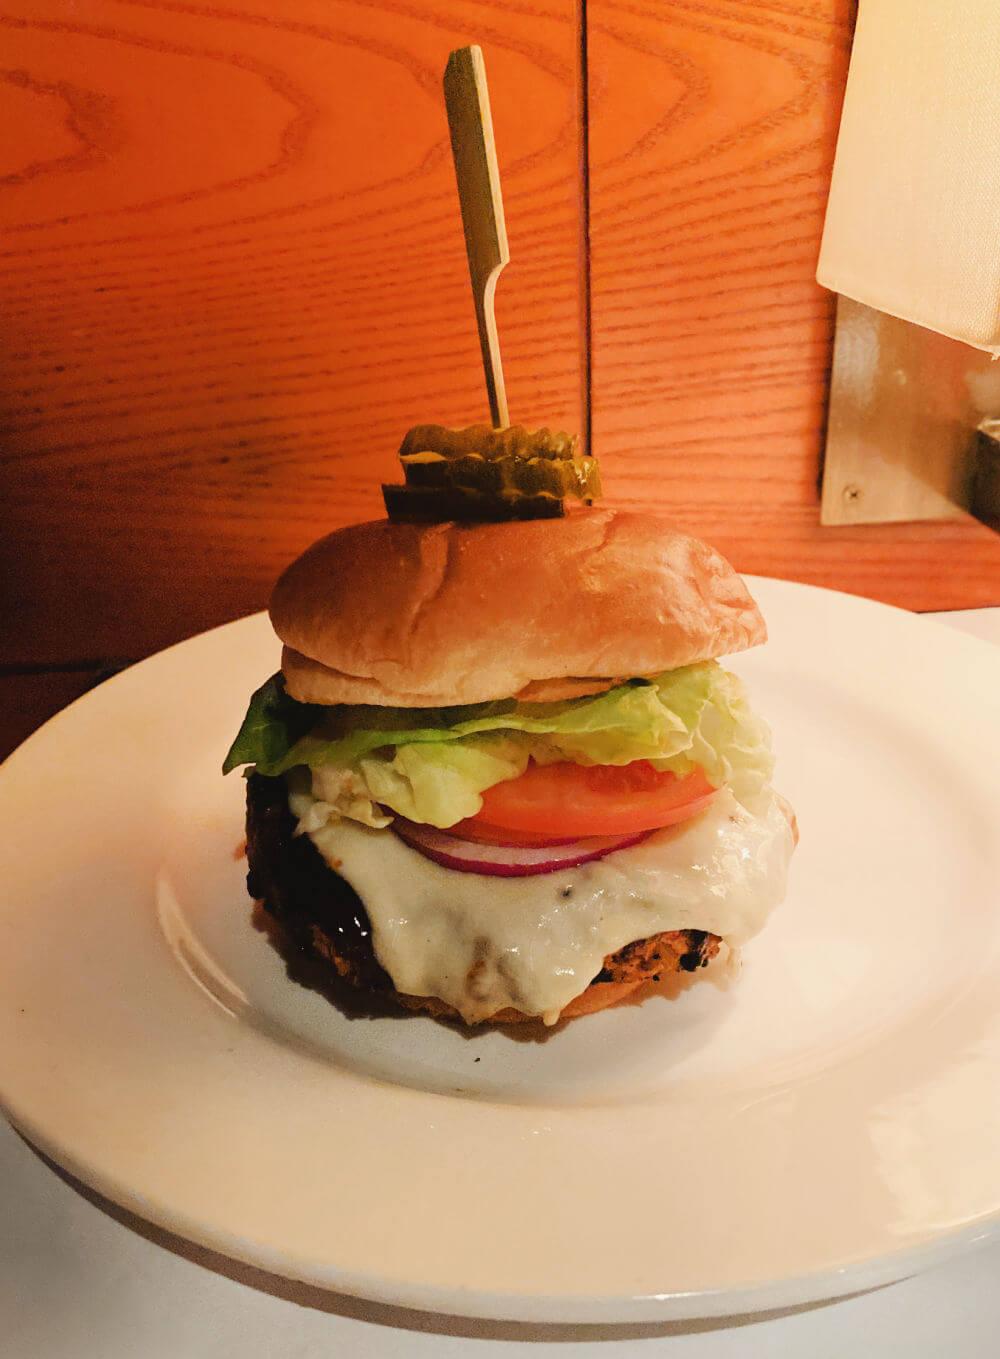 bricktop's veggie burger